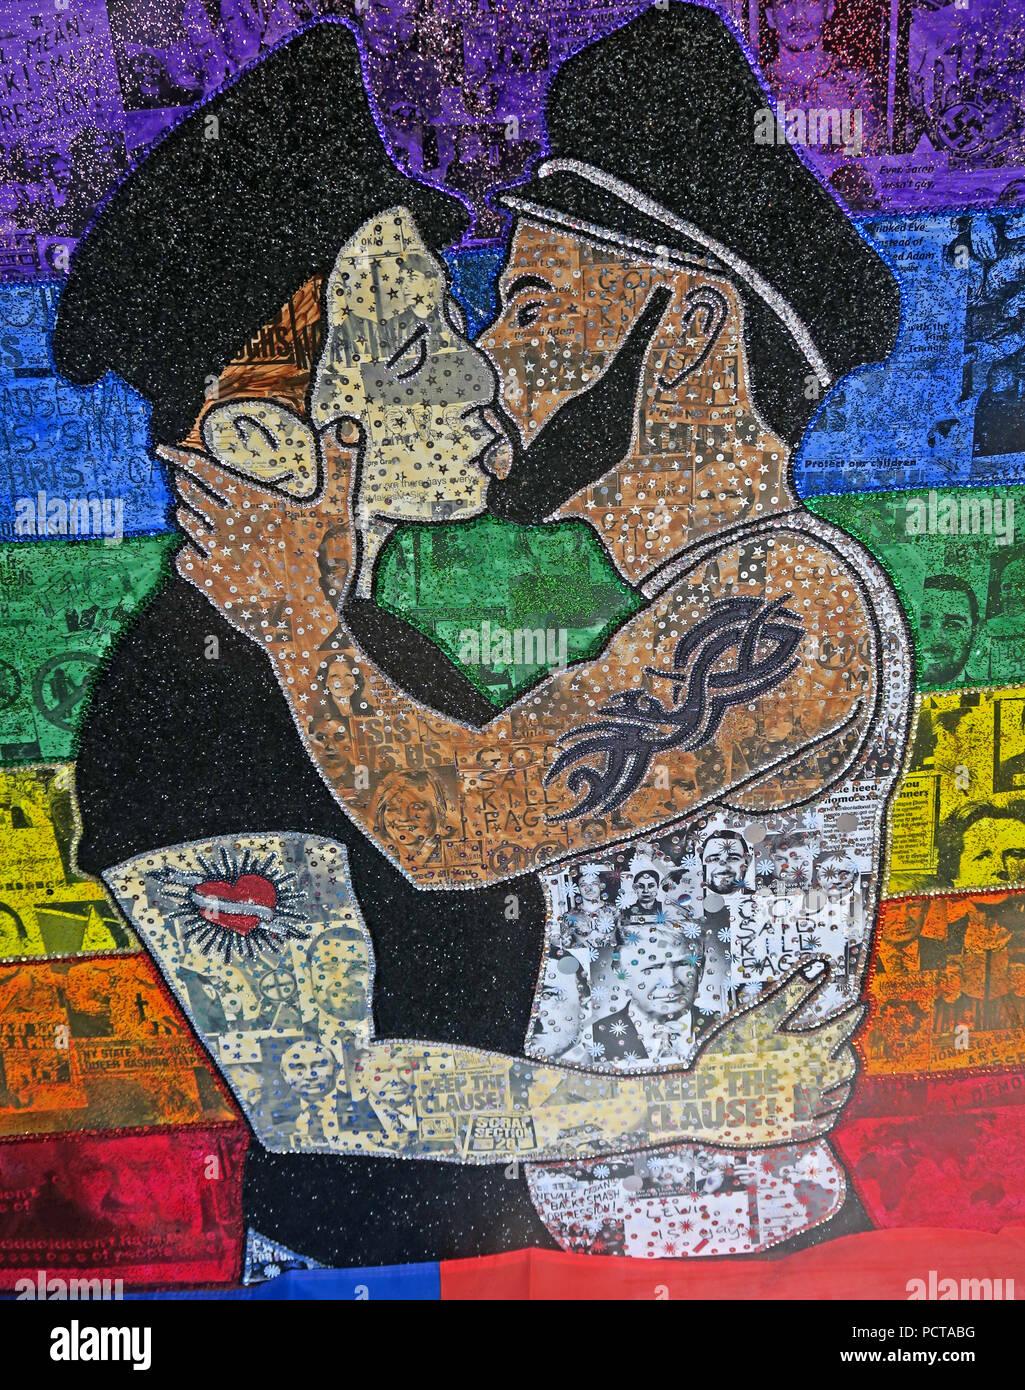 GoTonySmith,@HotpixUK,artist,artwork,rainbow,gay,gay